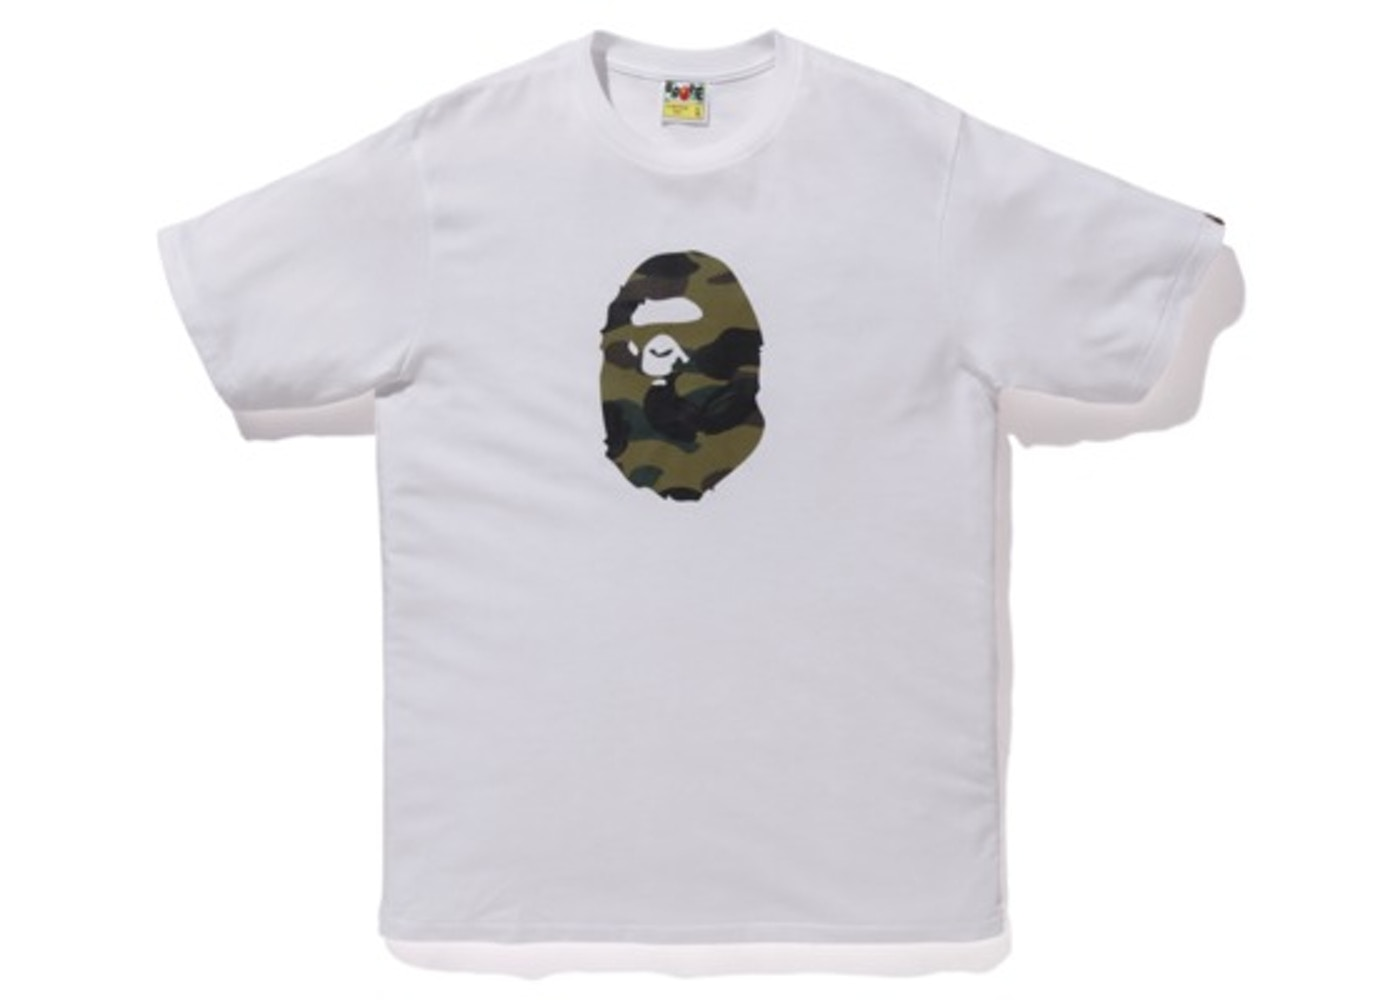 927660ca BAPE Premium Summer Bag 1st Camo Ape Head Tee White/Green - SS19